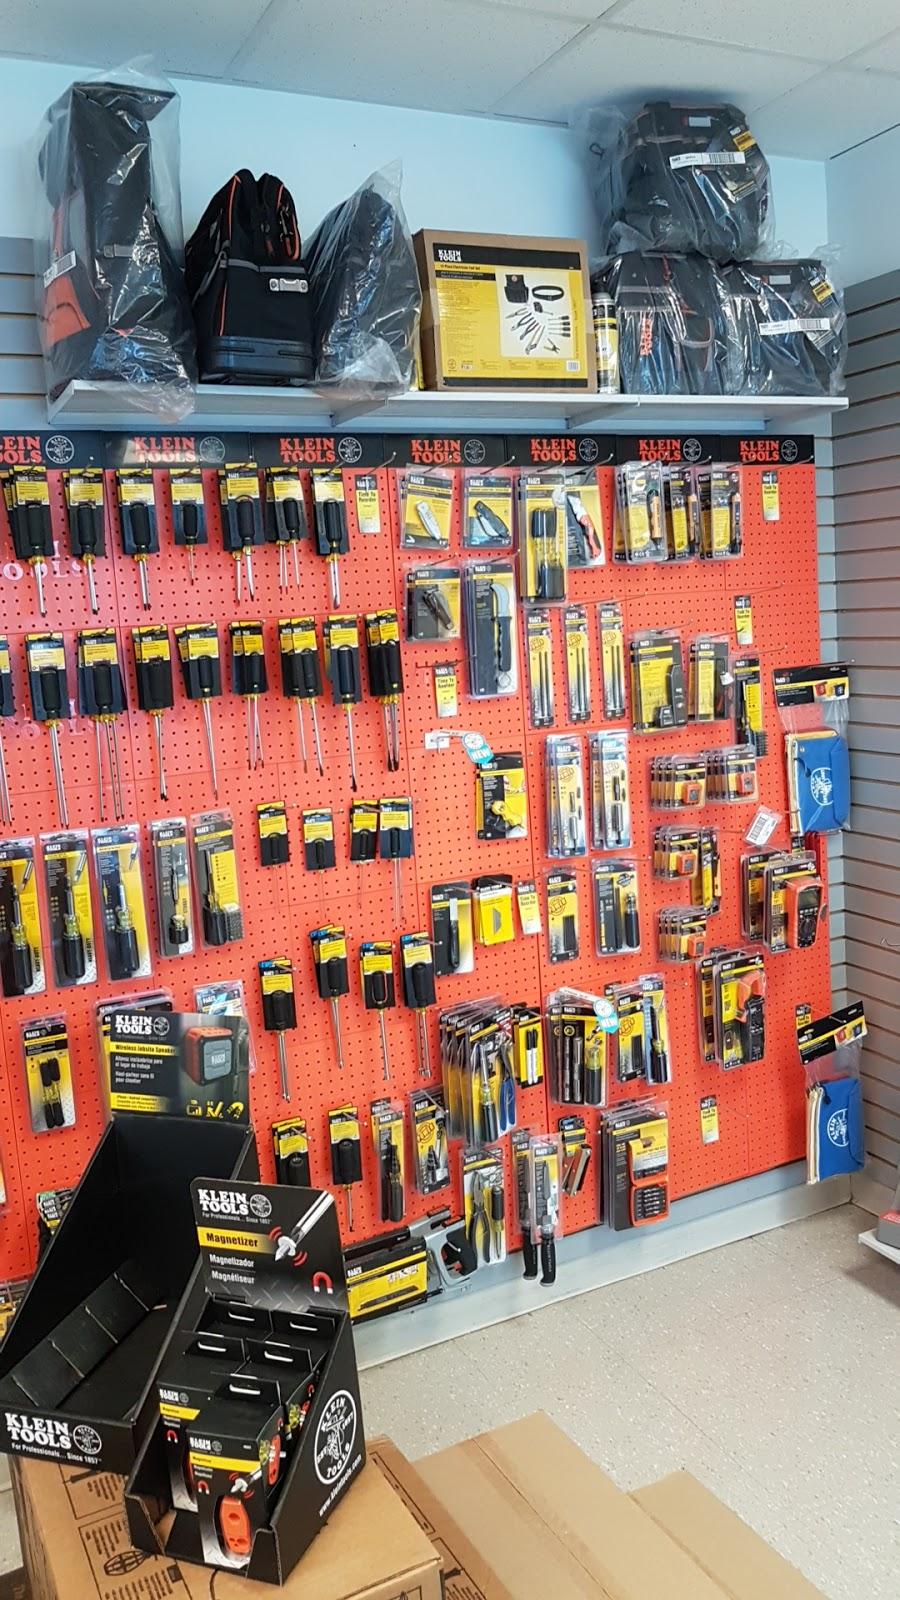 Westburne   store   676 Westburne Dr #2, Concord, ON L4K 4V5, Canada   9058792642 OR +1 905-879-2642